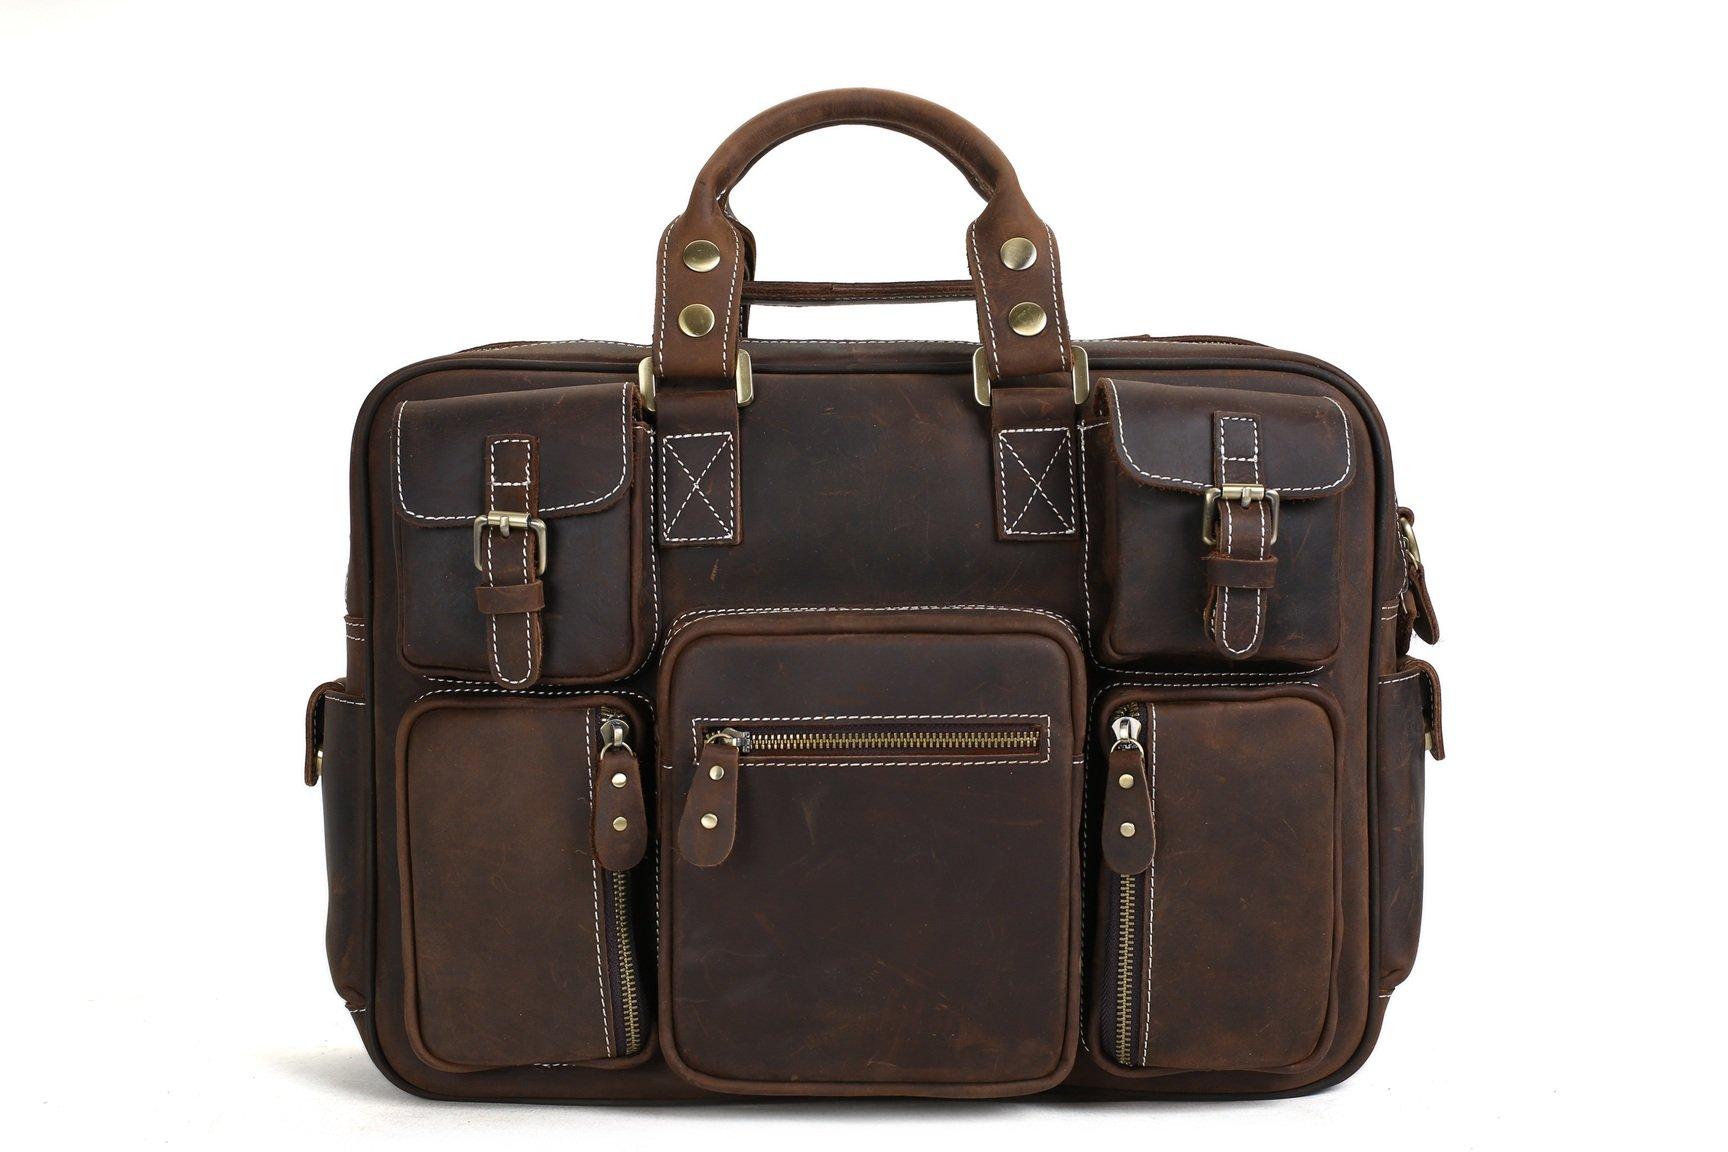 9a8ad99c68458 MoshiLeatherBag - Handmade Leather Bag Manufacturer — Handcrafted Vintage Extra  Large Genuine Leather Travel Bag Duffle Bag Organizer Bag 7028